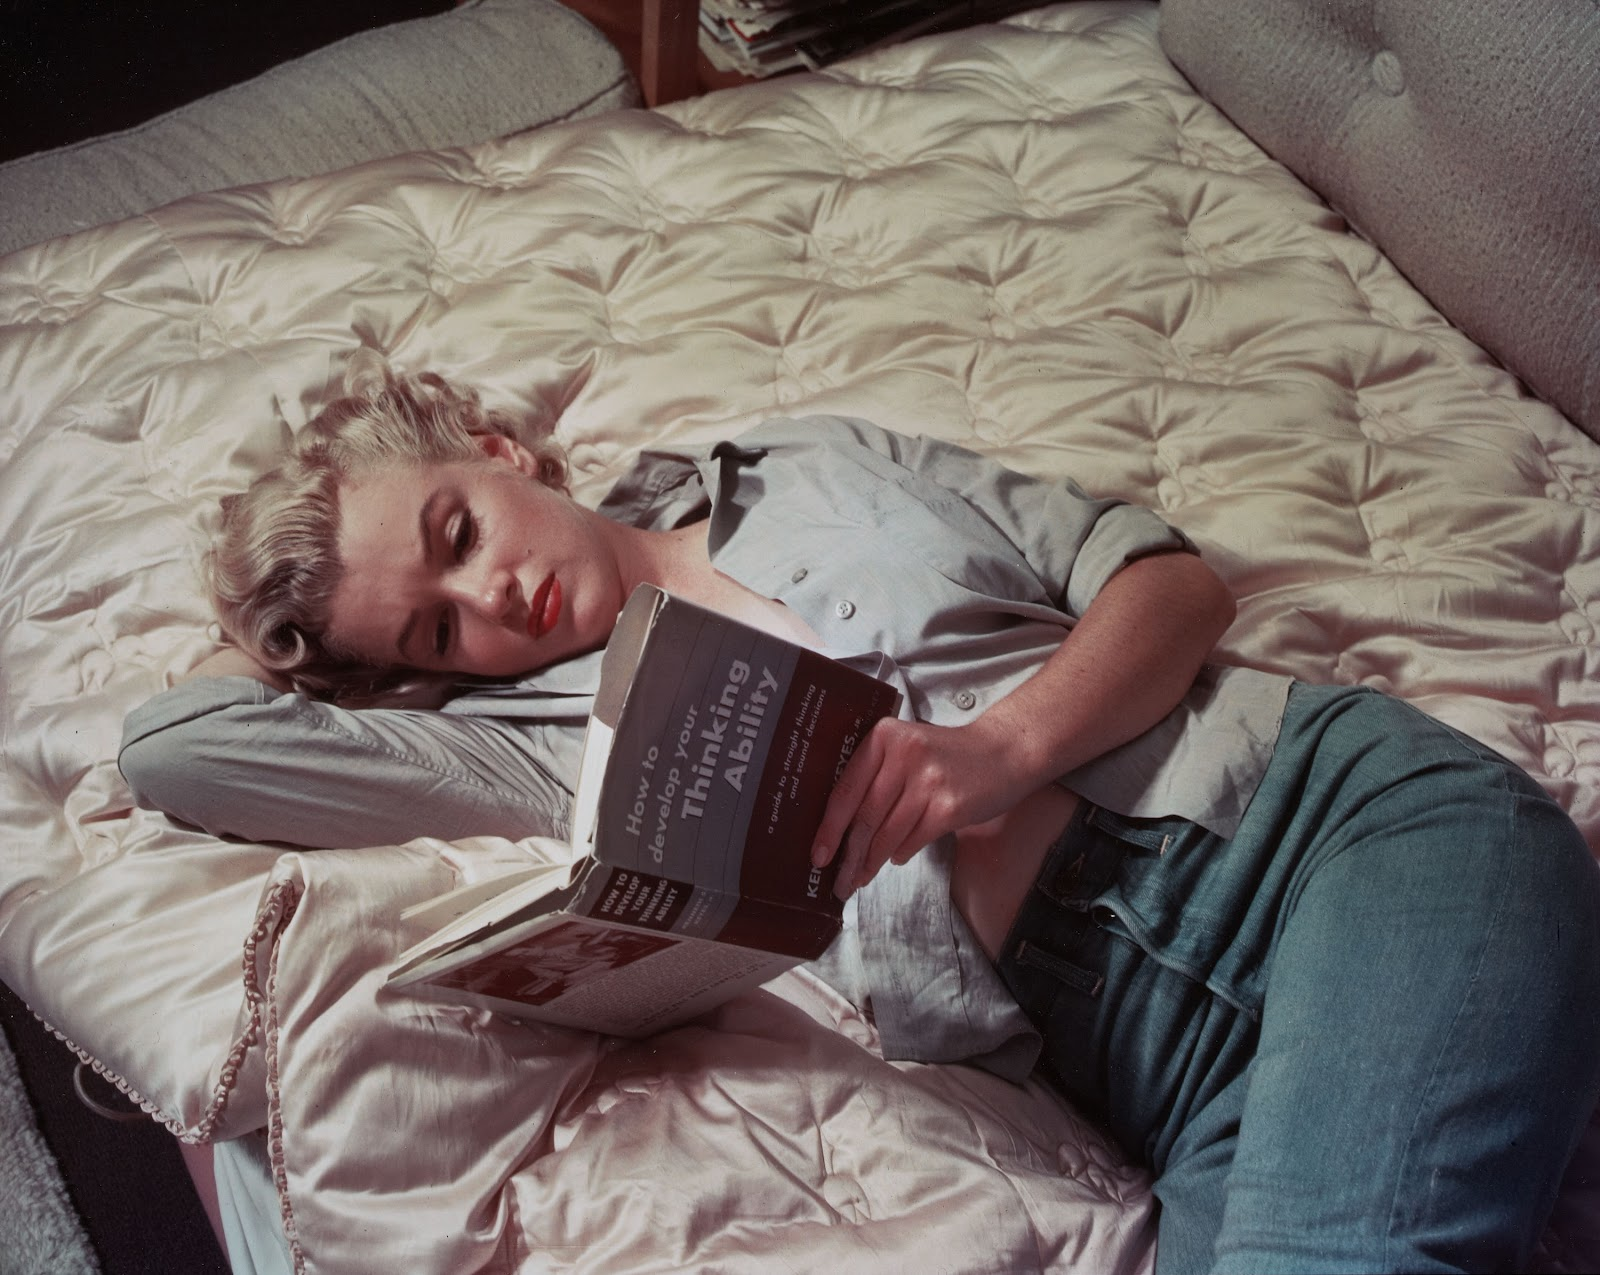 http://2.bp.blogspot.com/-GS0KboWmu5M/T24am2wF_tI/AAAAAAAAAOU/nW_nW0tfHQI/s1600/marilyn-monroe-read-book-photo.jpg